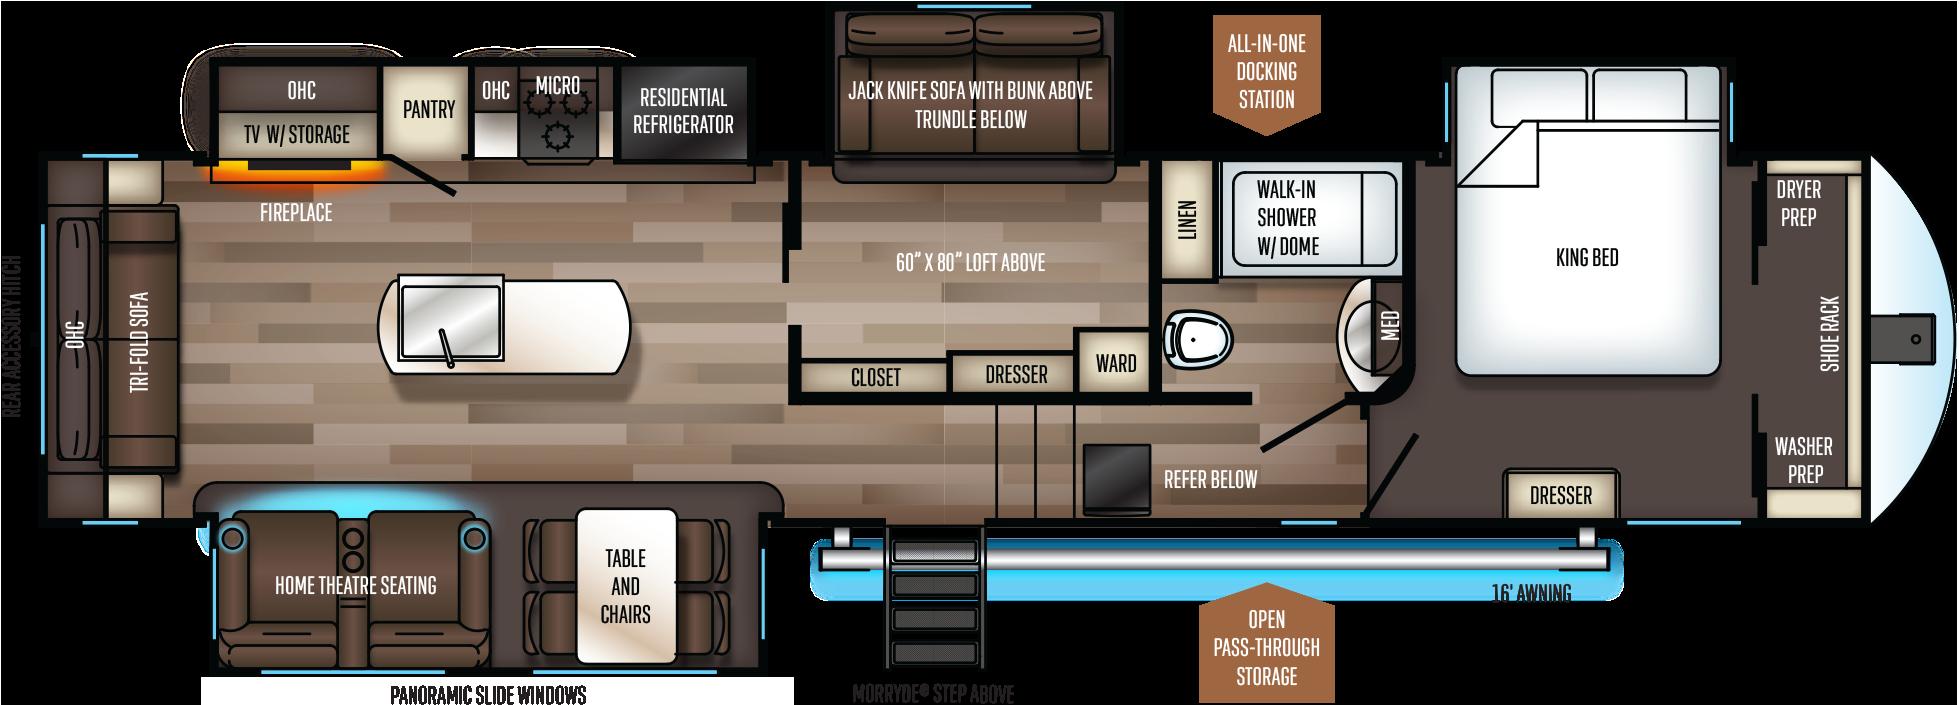 36bhq Floorplan